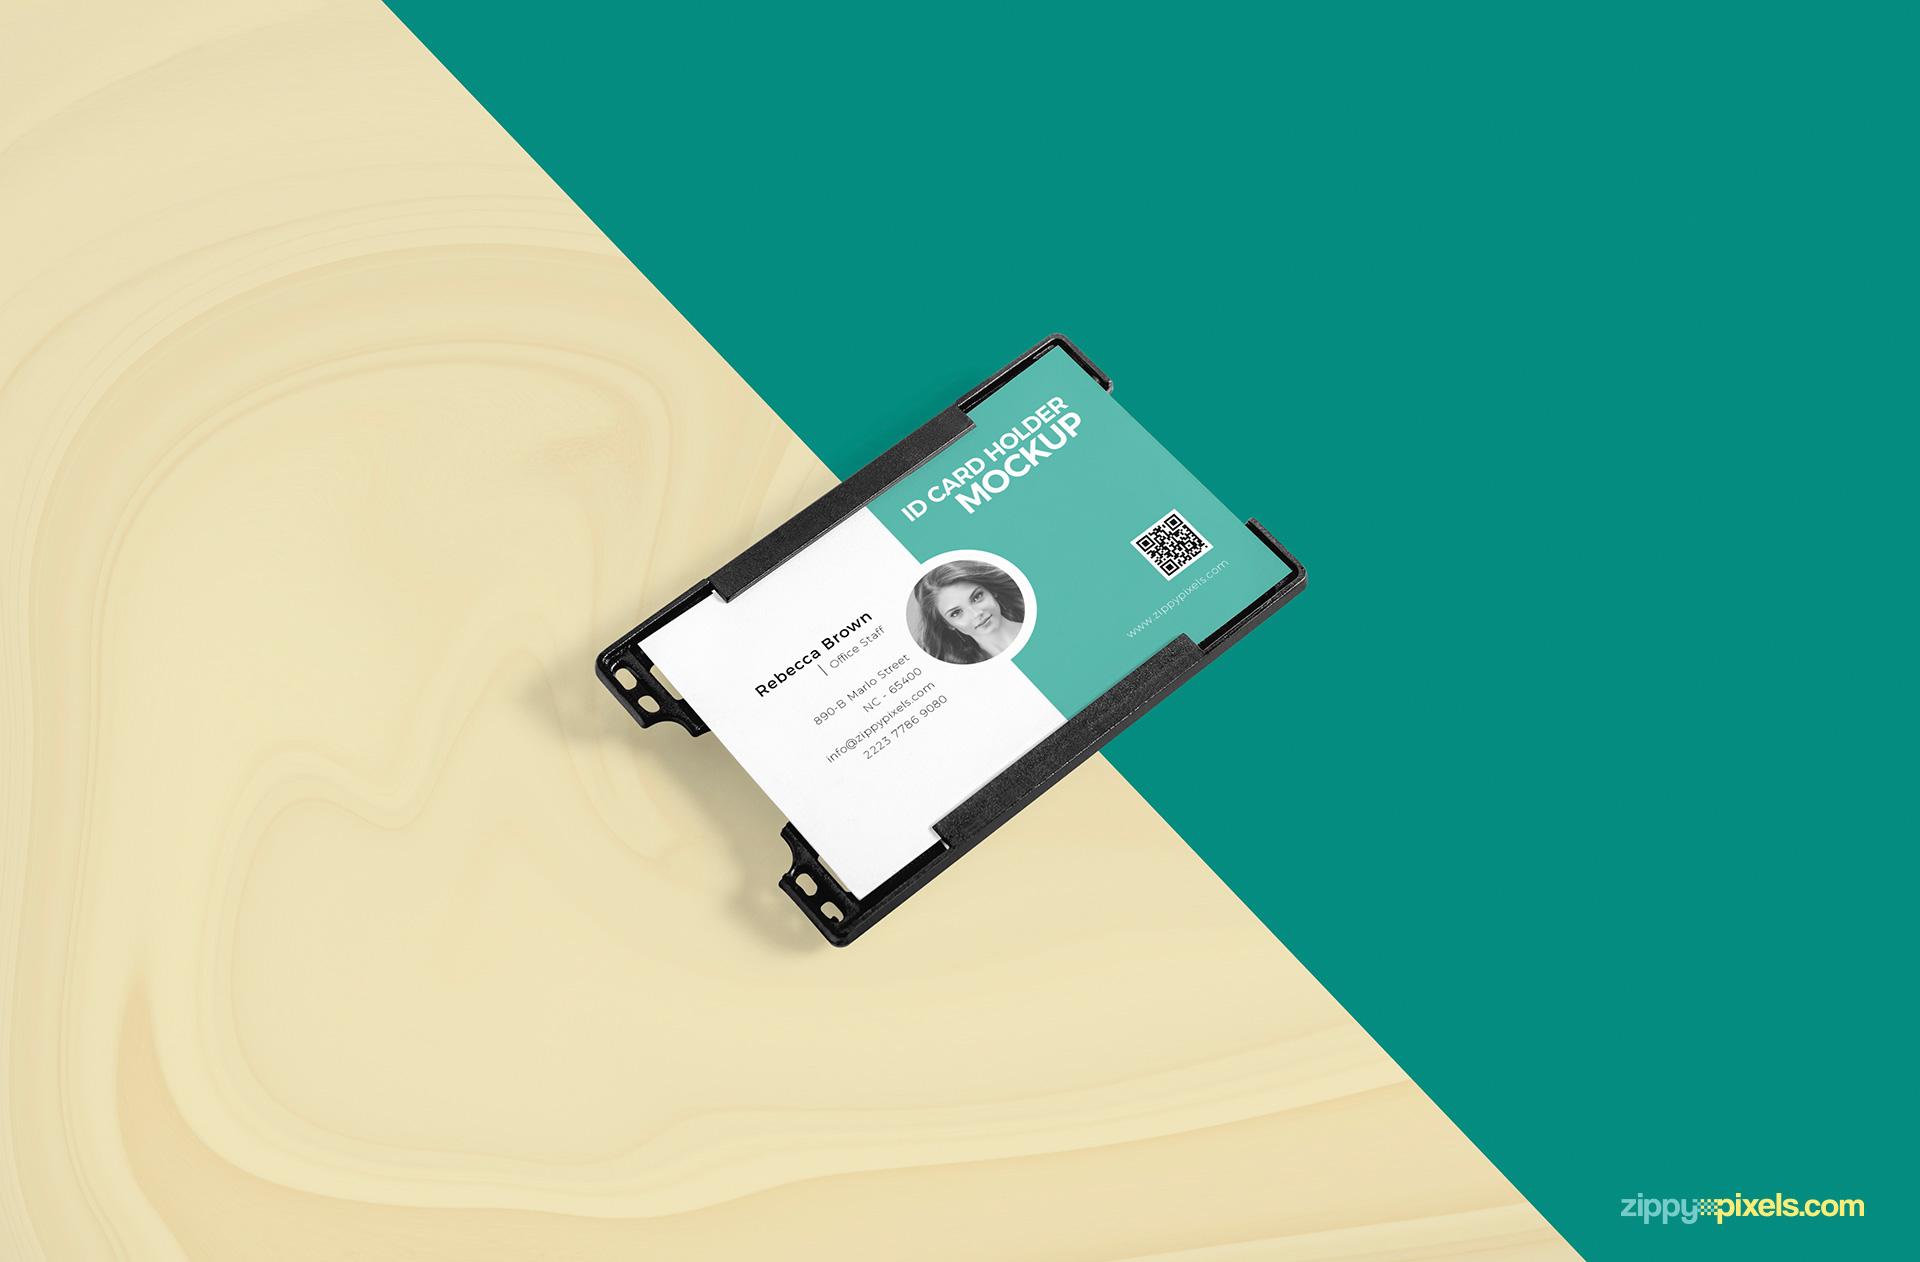 Id Card Holder Mockup Free Psd Download Zippypixels